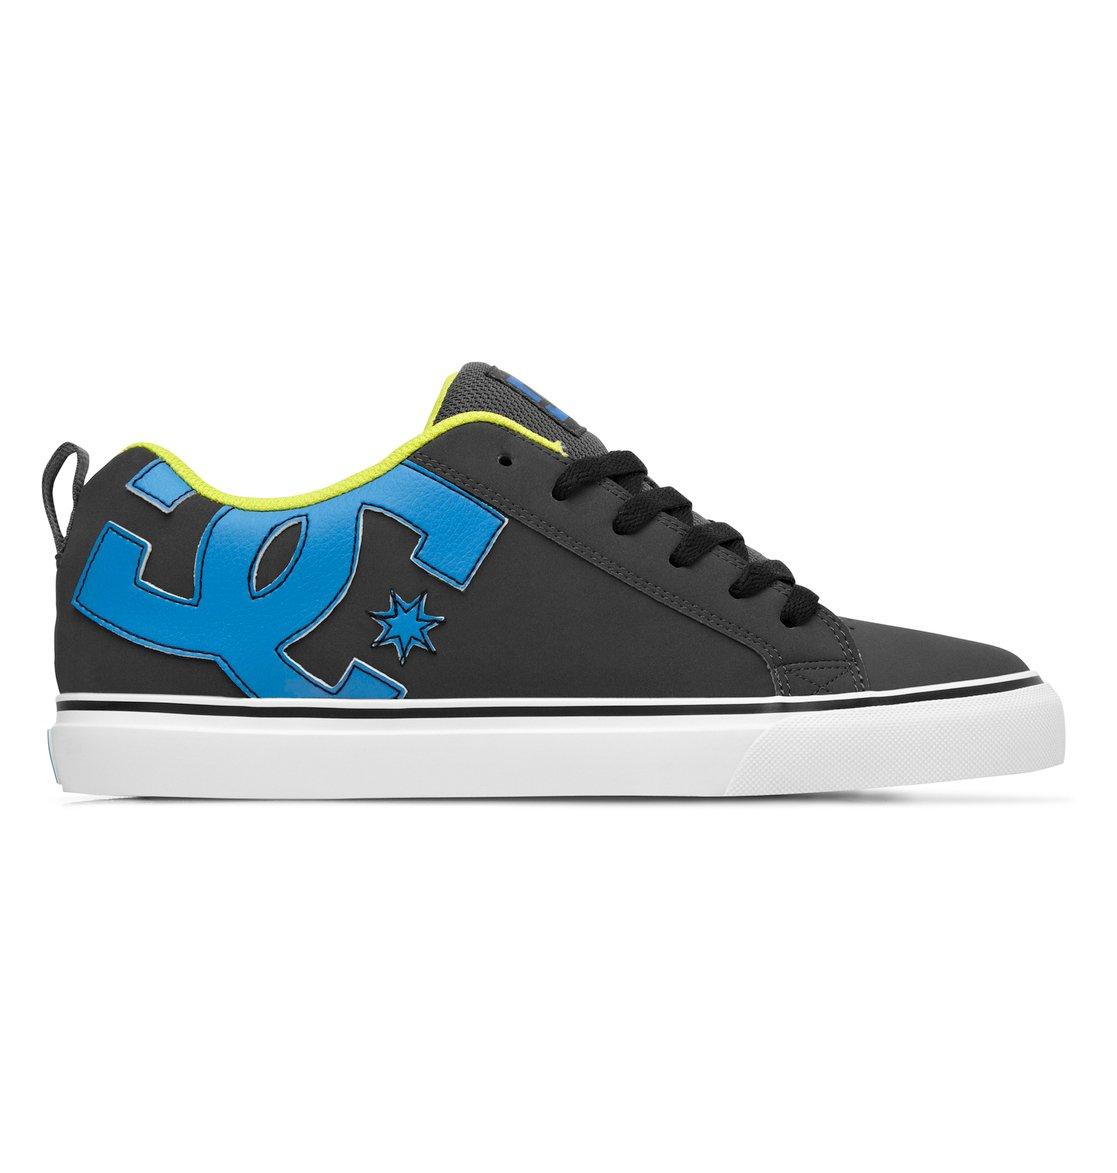 Mens Court Vulc Shoes 303181 Dc D Island Slip On British Comfort Leather Dark Brown 0